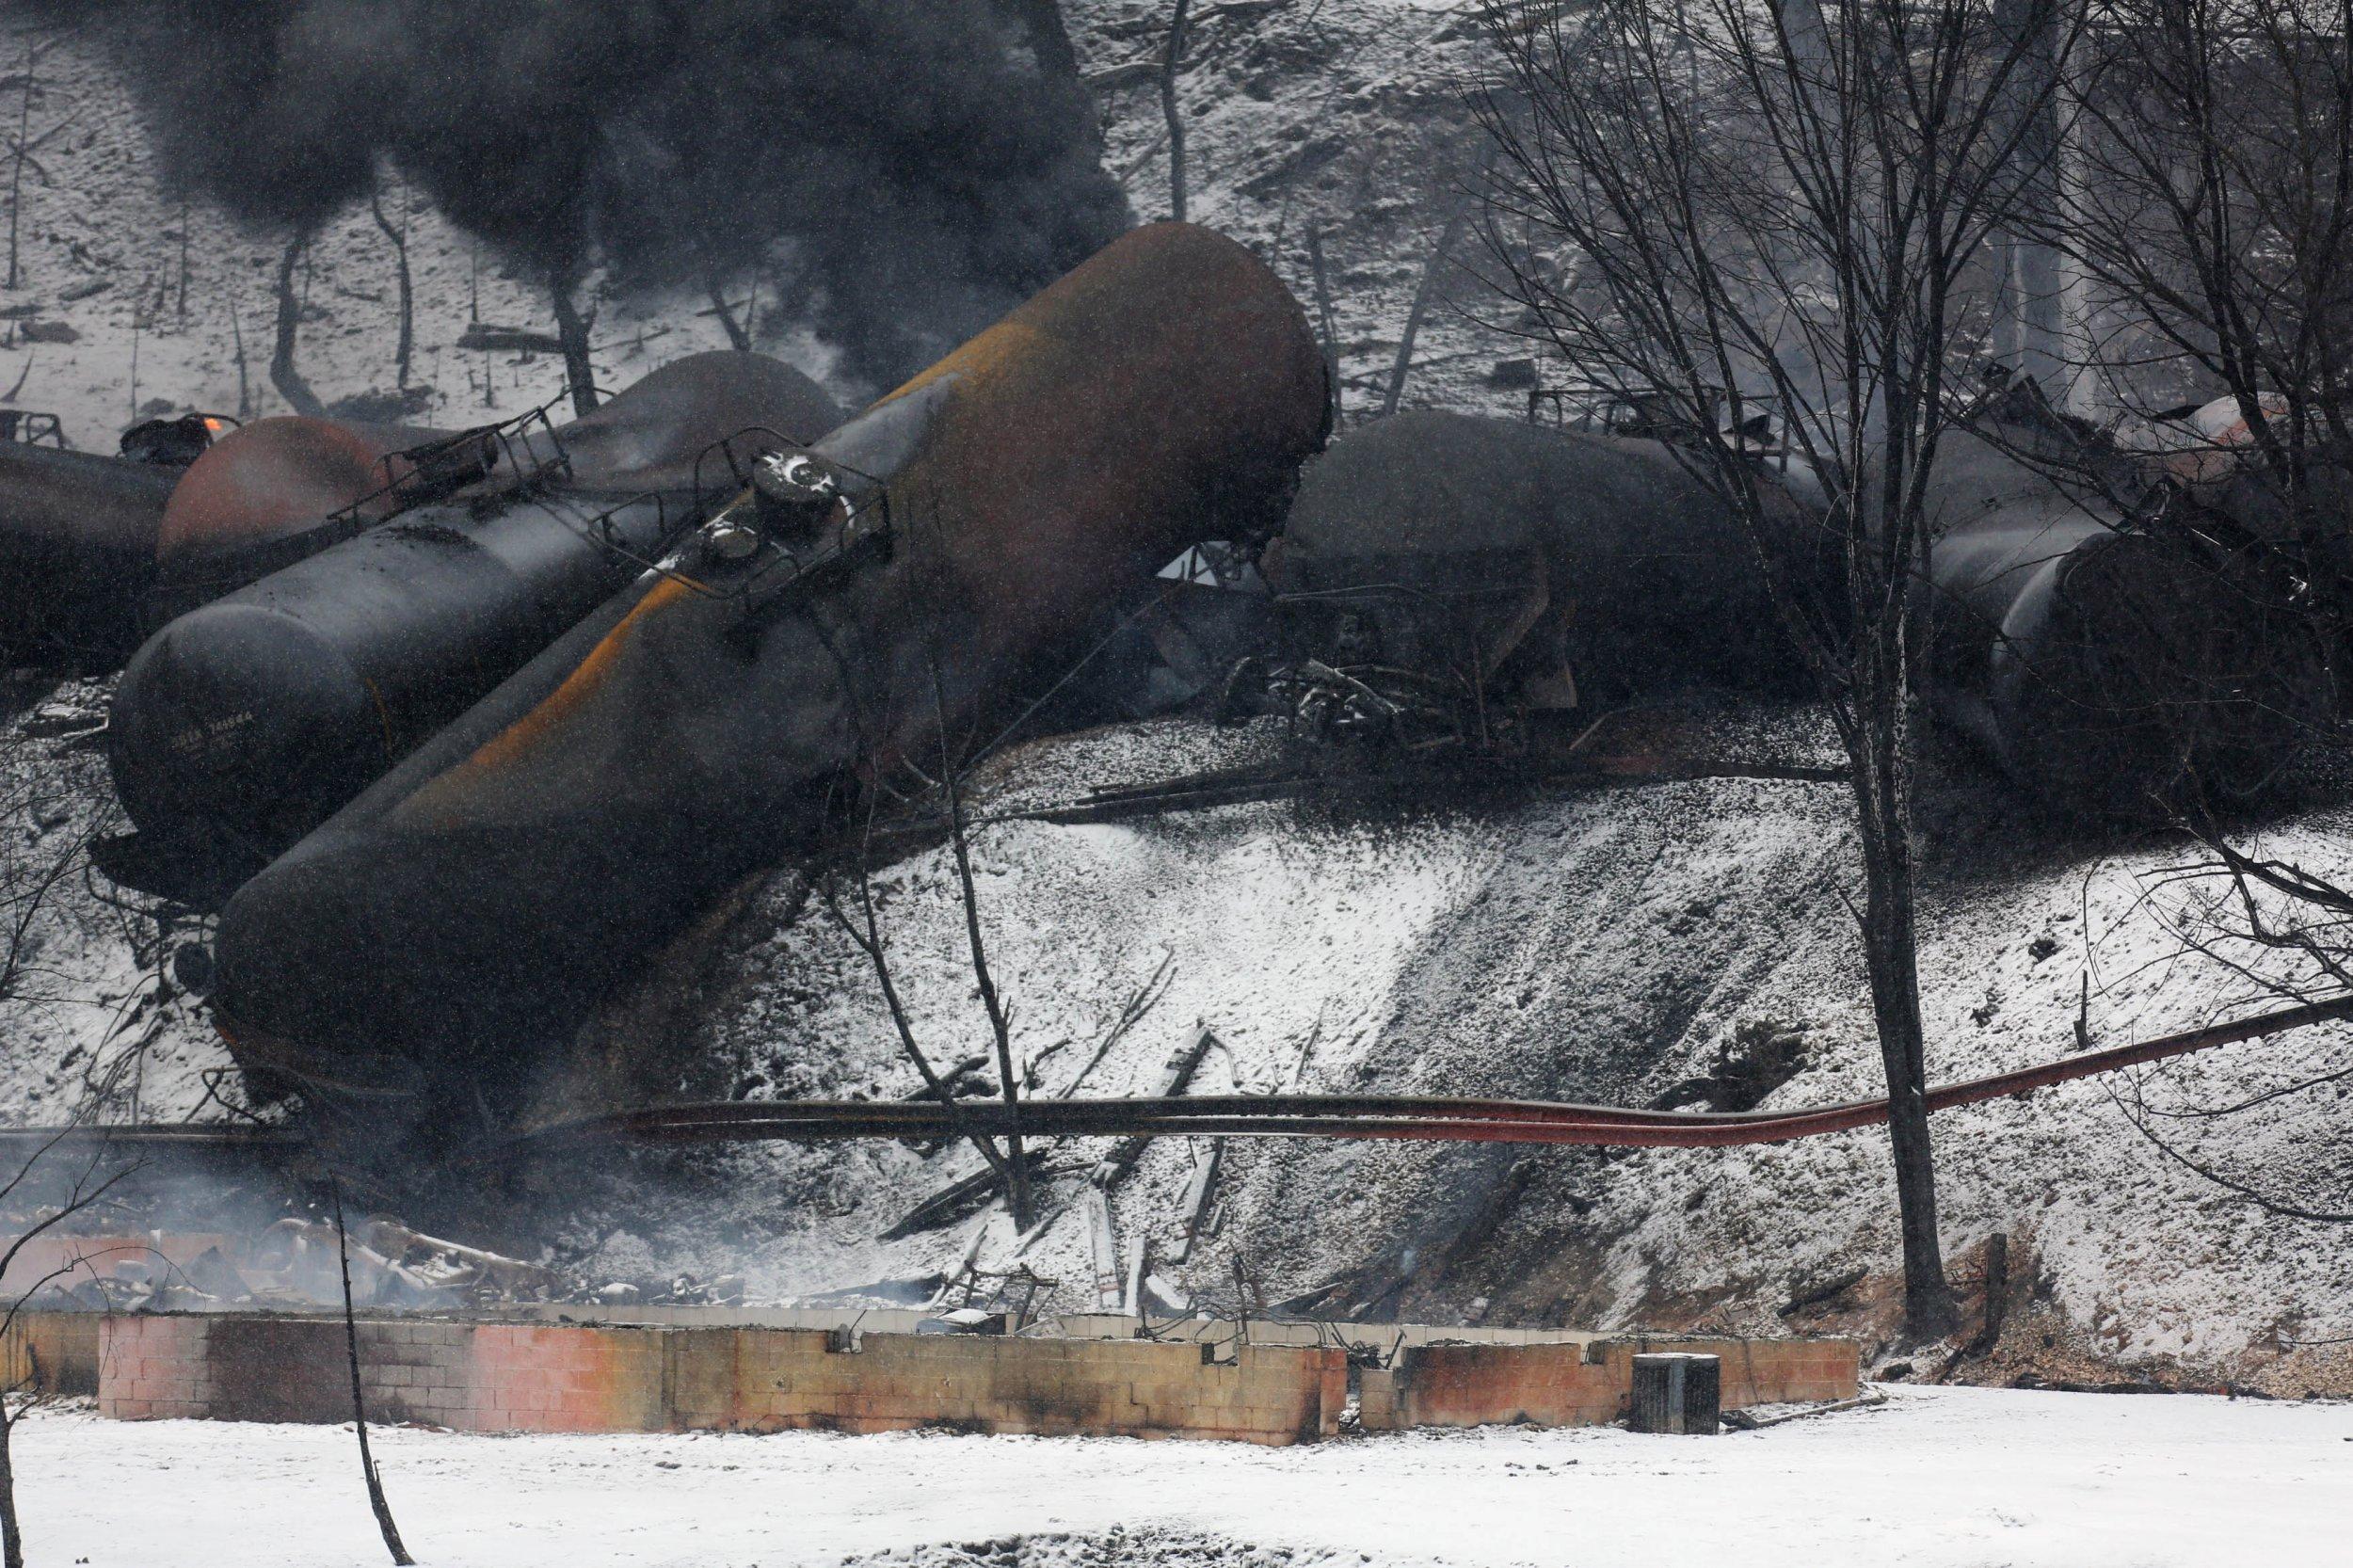 West Virginia train derailment